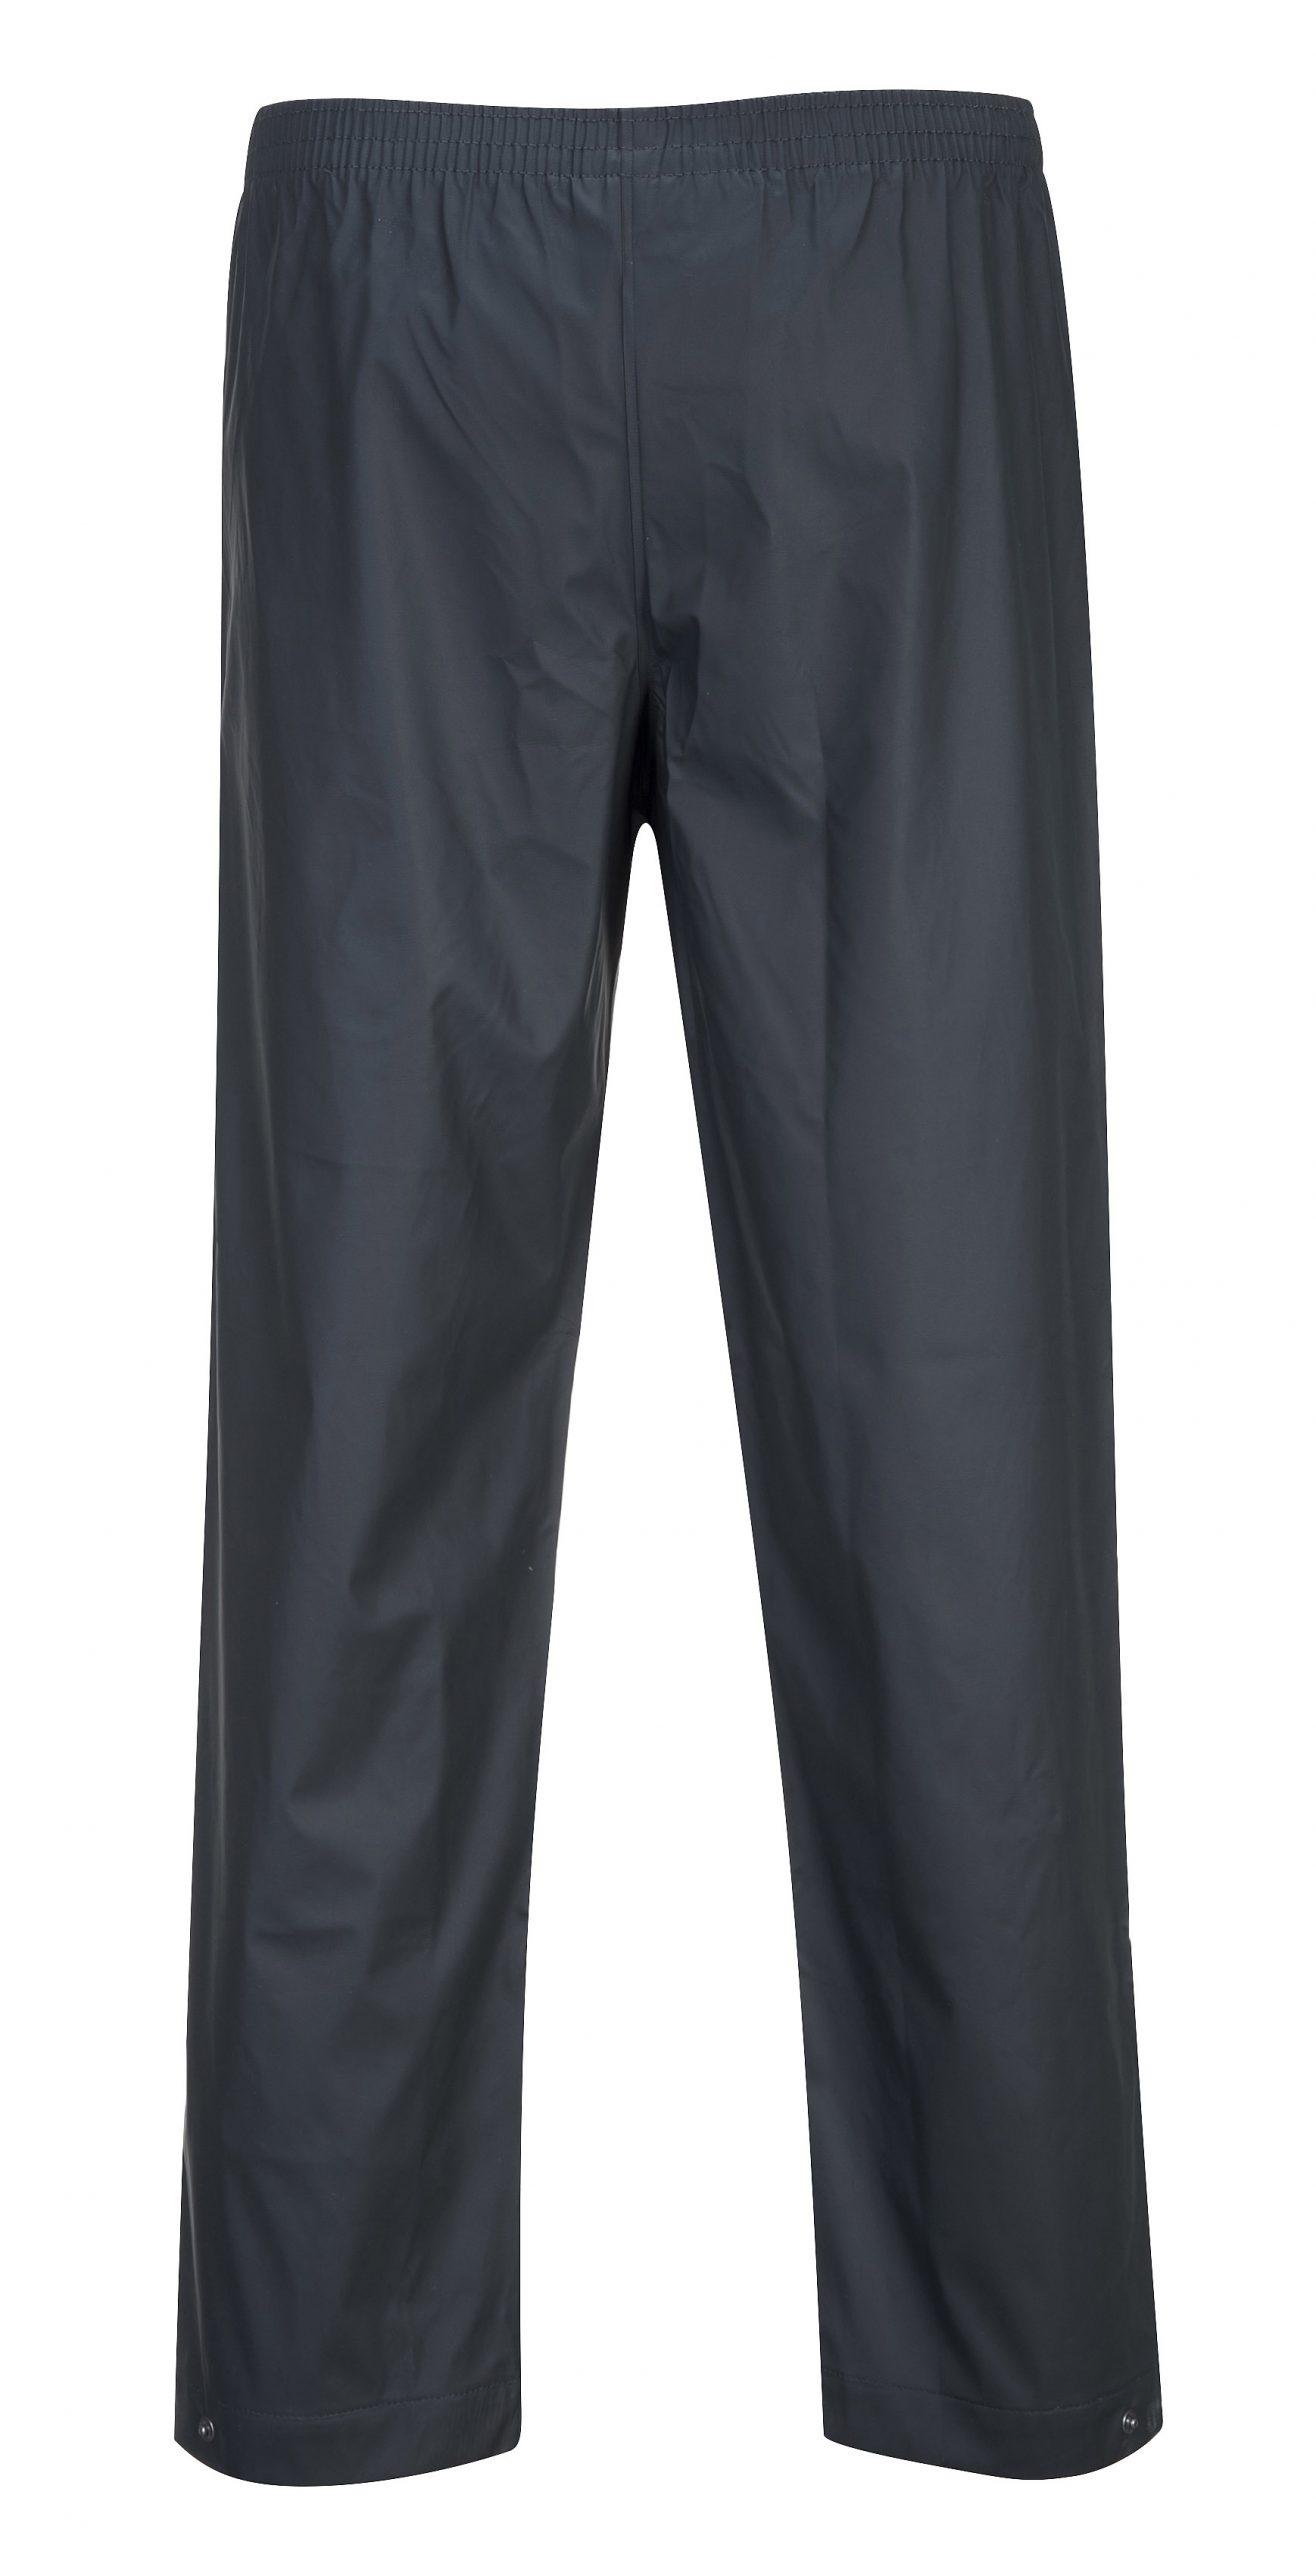 Portwest Sealtex Classic Trousers Waterproof Rain Elastic Waist Work Wear S451